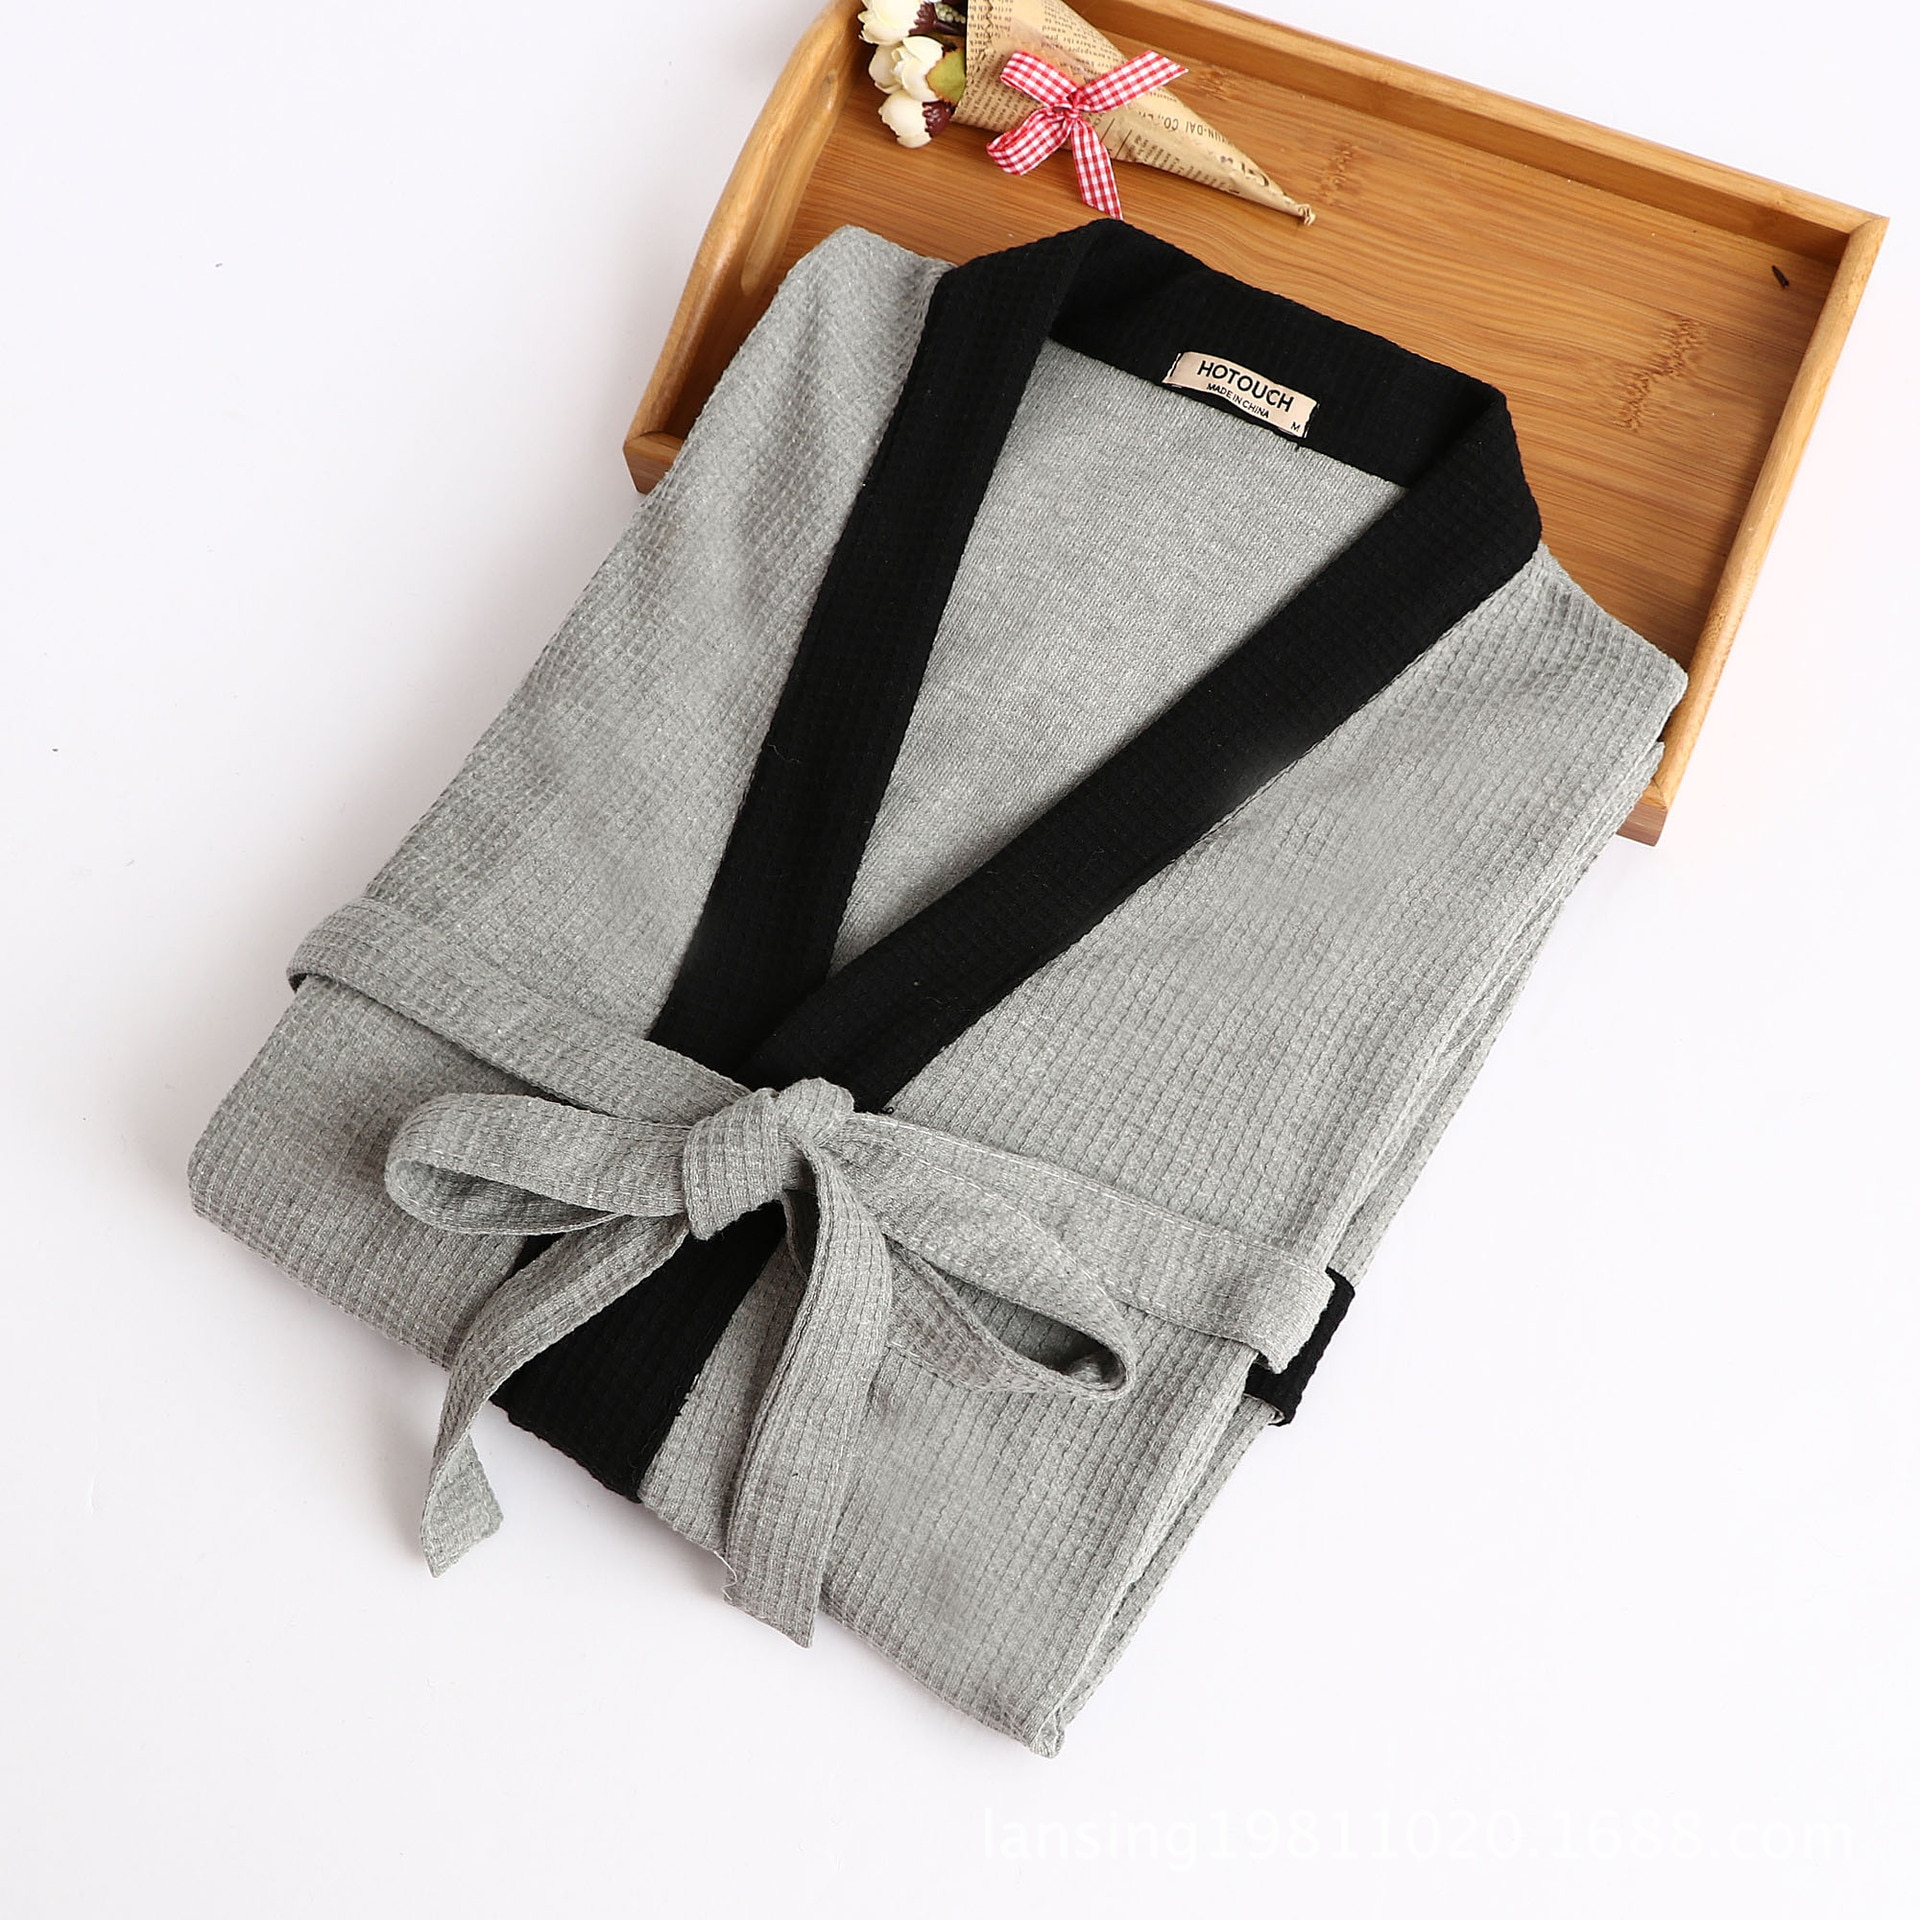 Полотенце халаты для мужчин халат De Chambre Homme Waffle Hotel халат сауна и ванна полотенца Albornoz Ducha Szlafrok Meski Fashion